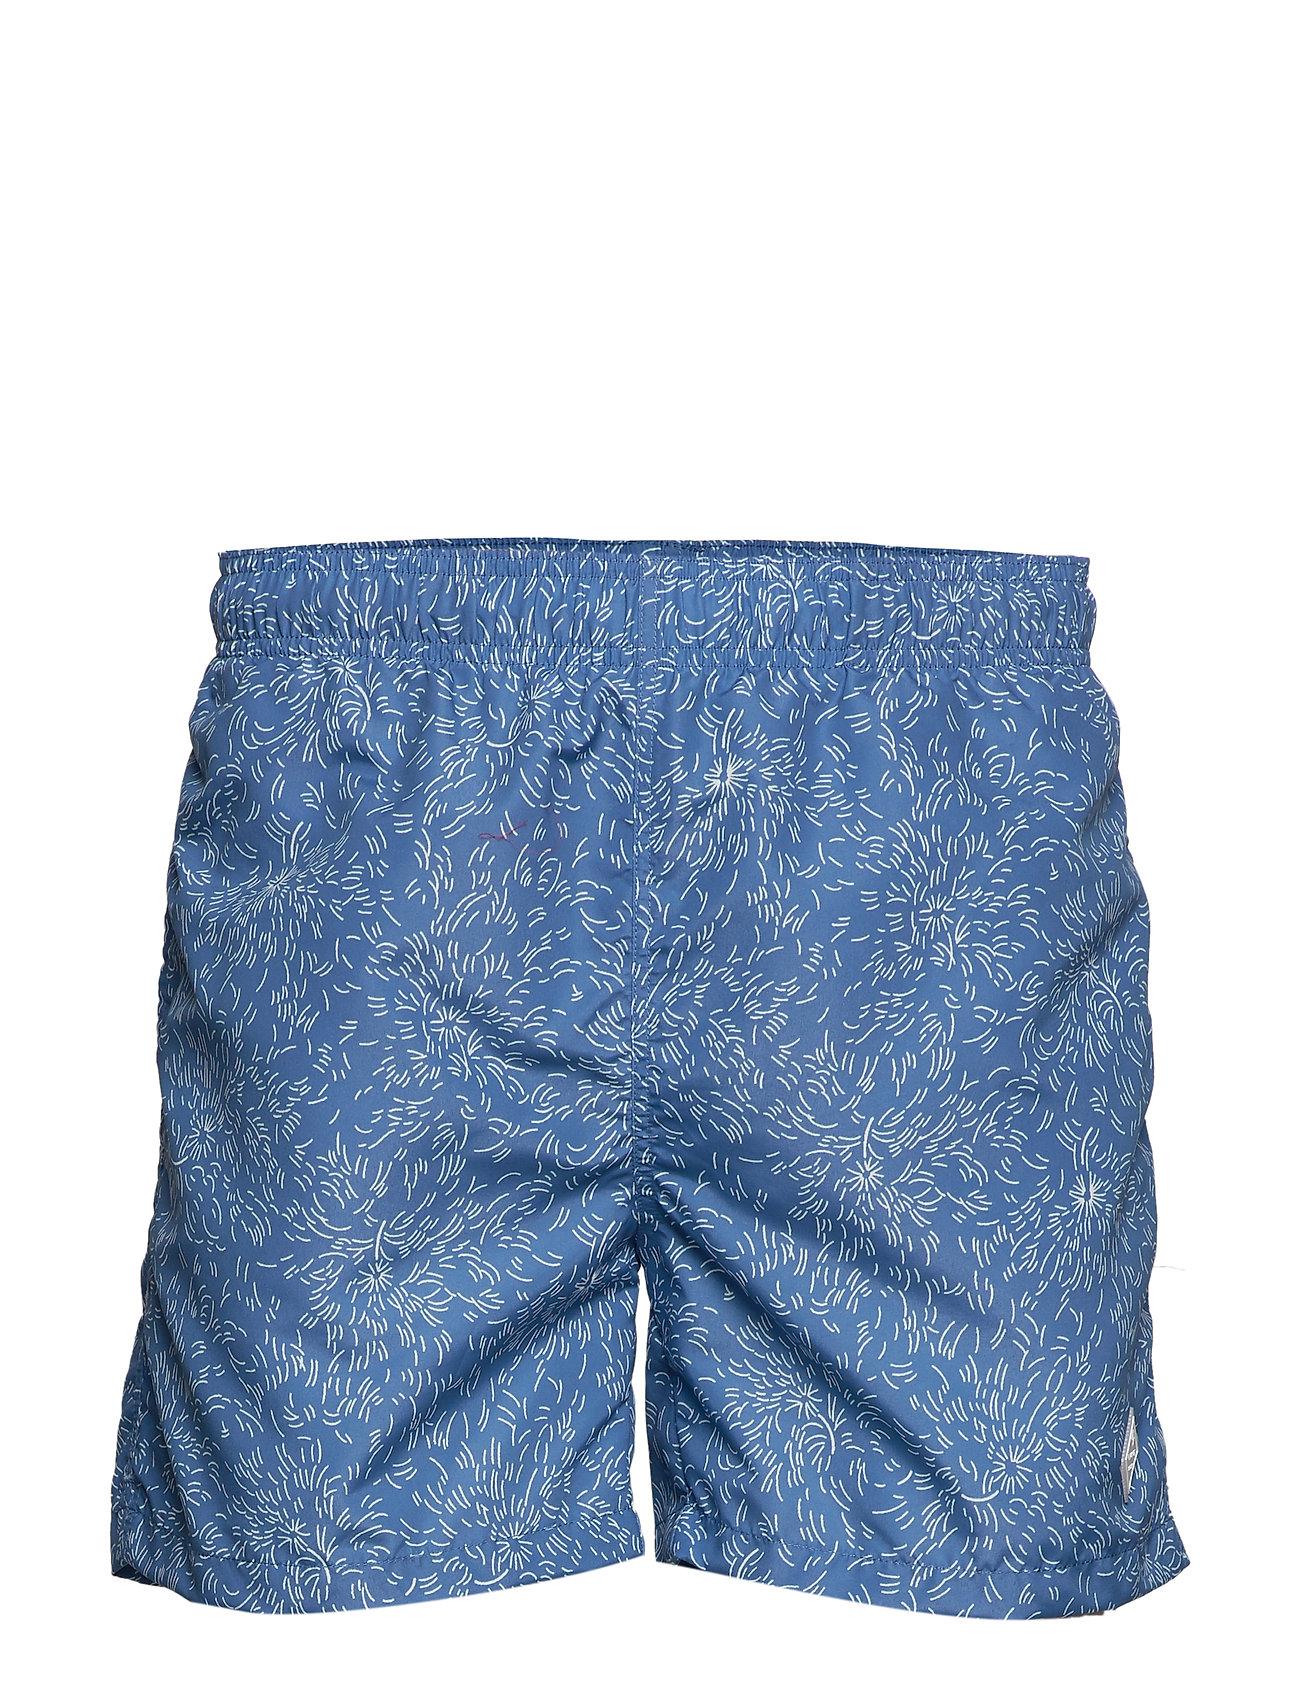 Dandelion C fposeidon Shorts BlueGant Swim Nwk8Z0OPnX